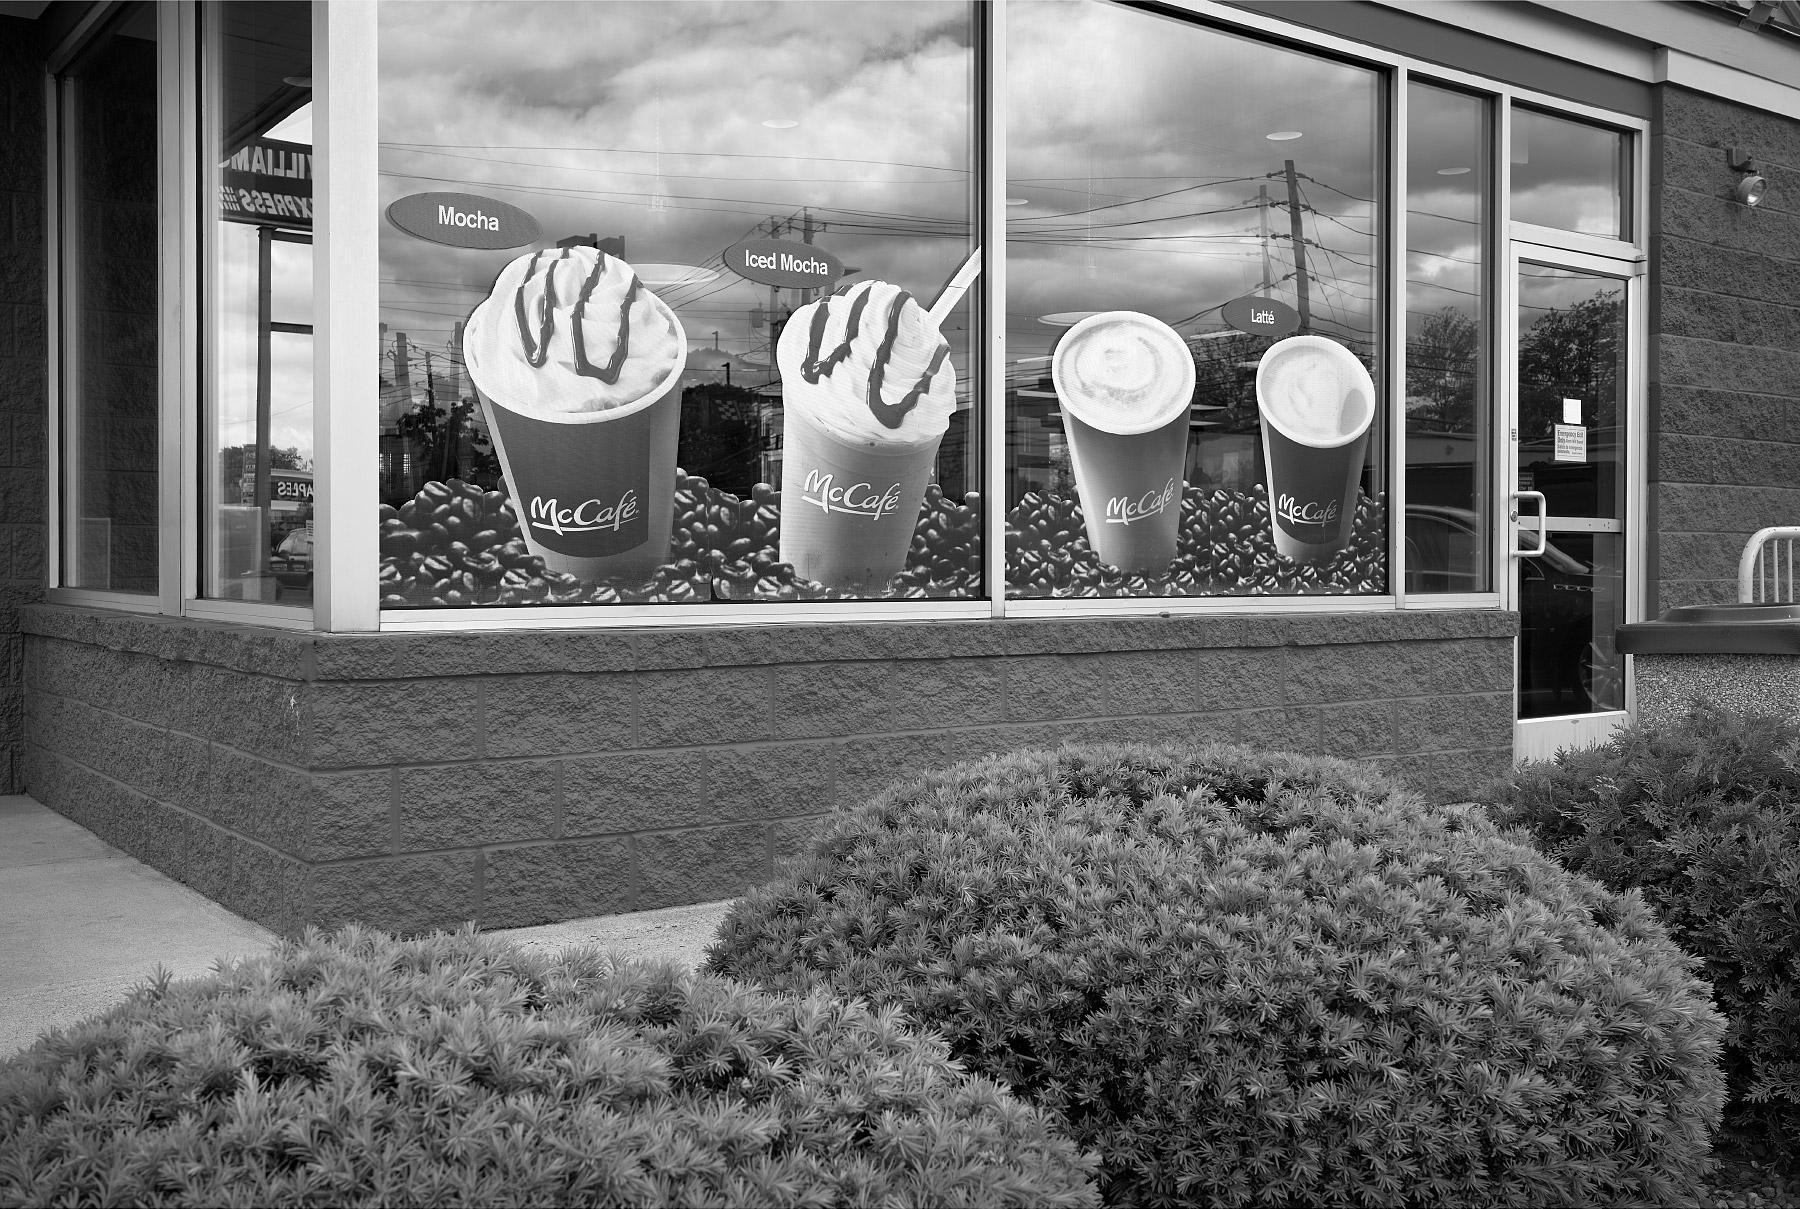 """McCafe,"" McDonald's, Allentown, PA"